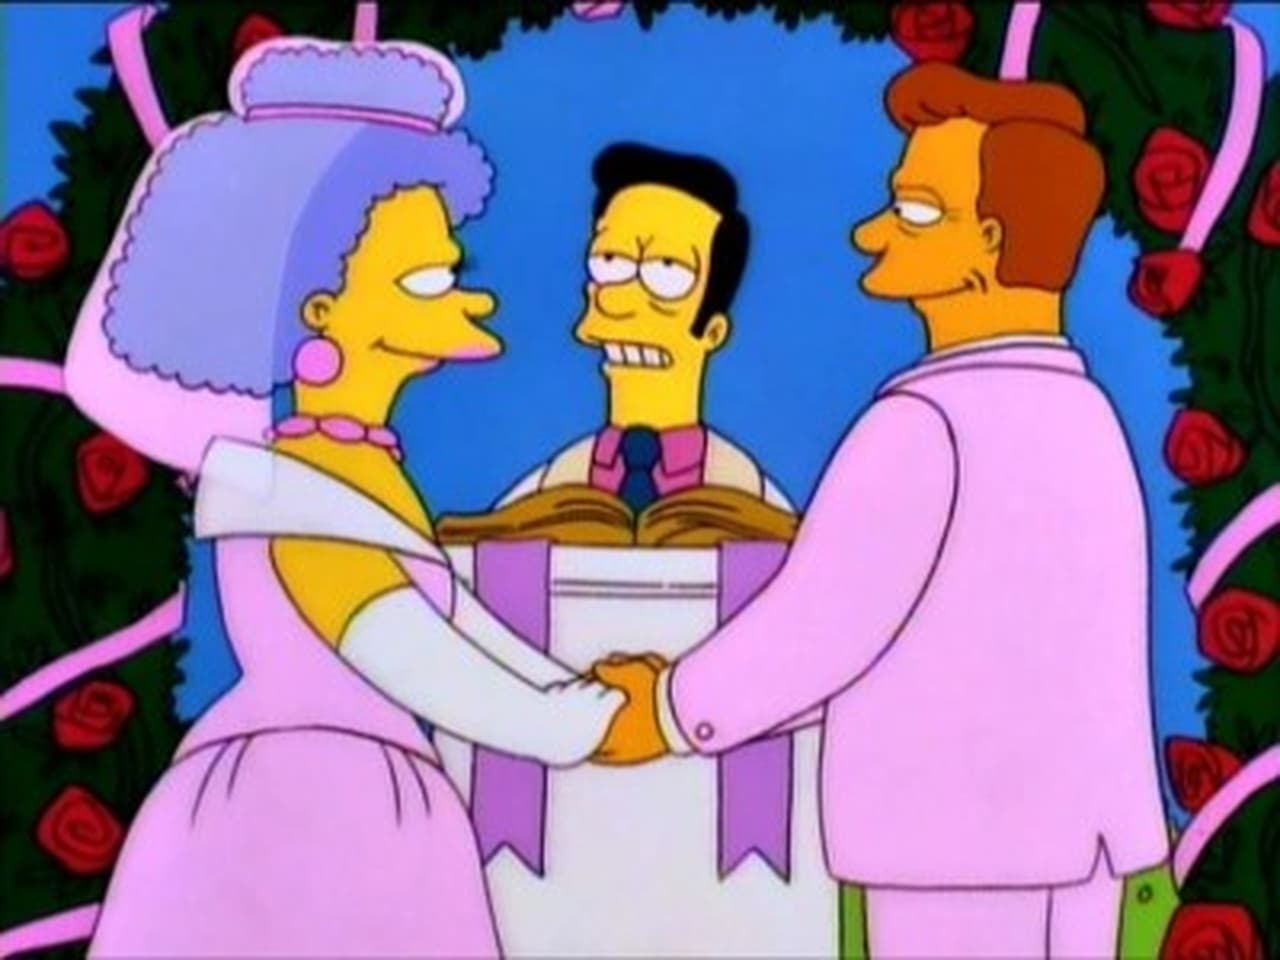 The Simpsons - Season 7 Episode 19 : A Fish Called Selma